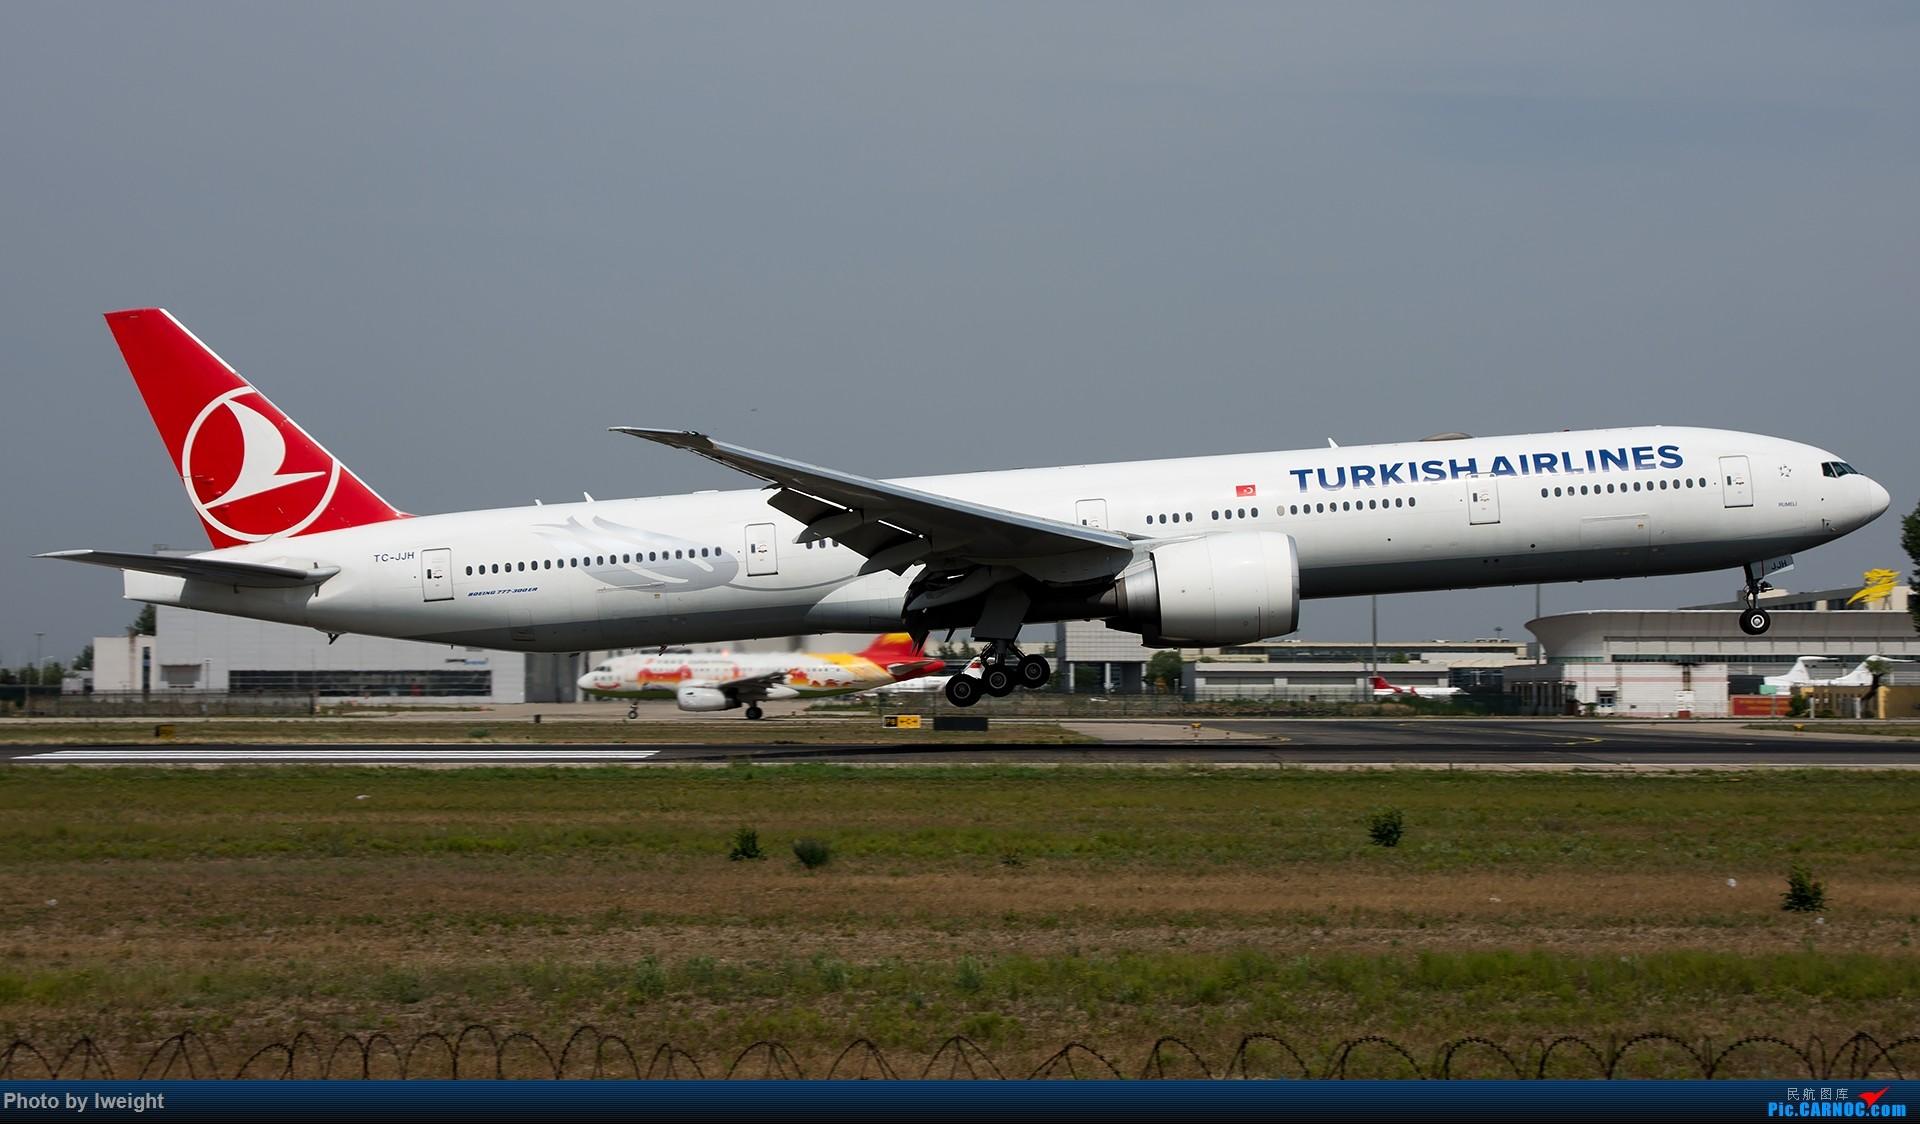 Re:[原创]很不错的天气,18R一组 BOEING 777-300ER TC-JJH 中国北京首都国际机场